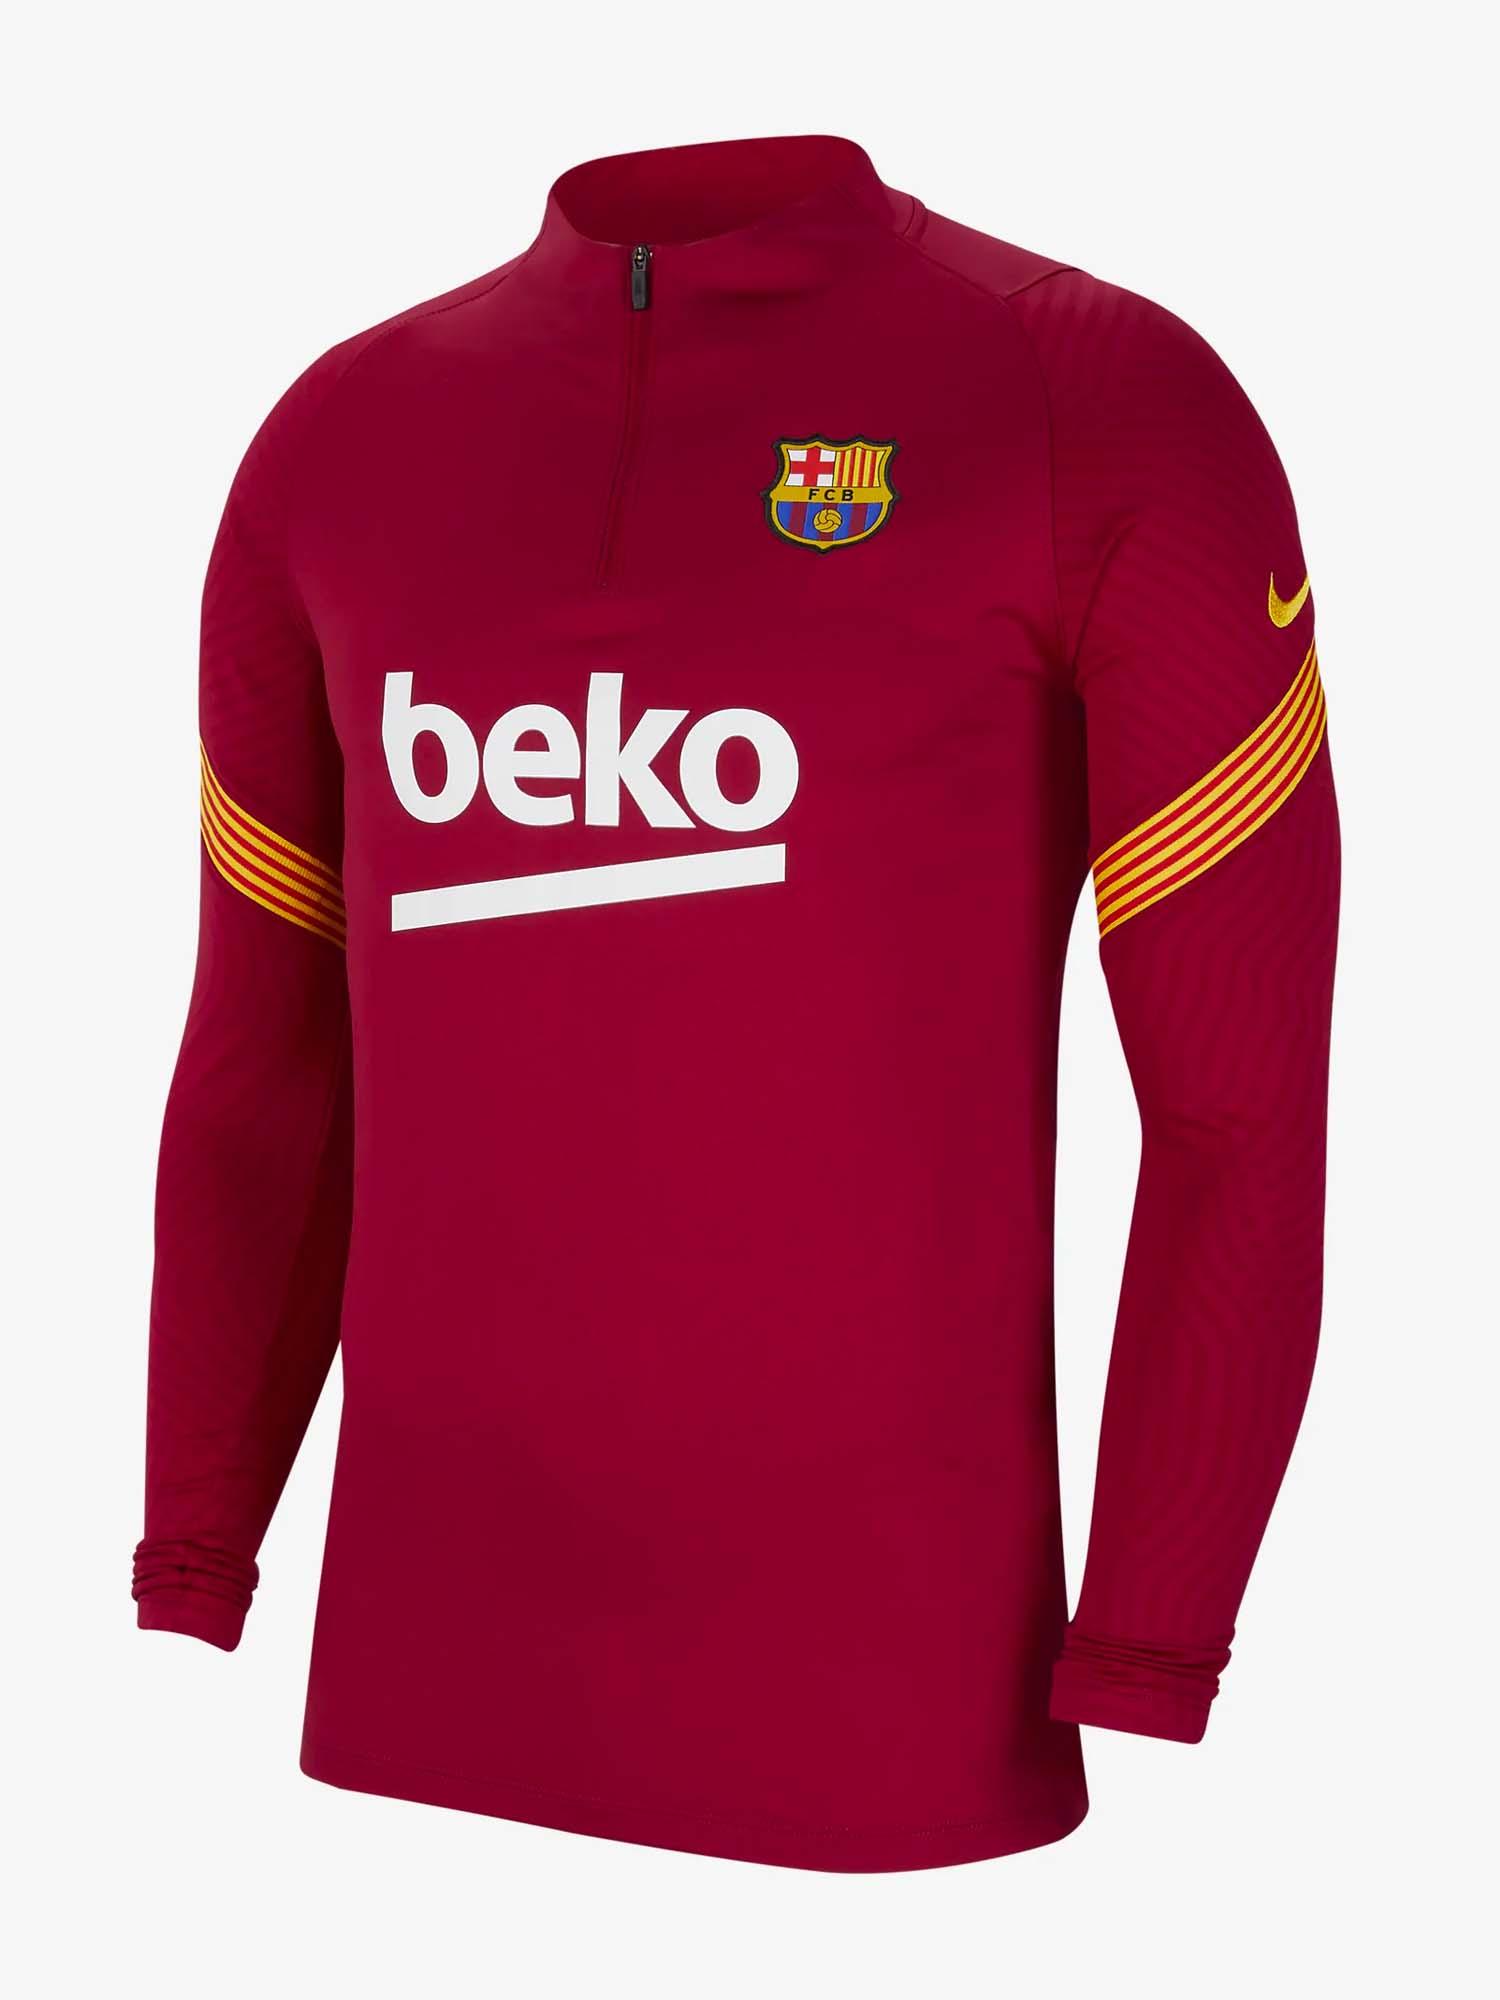 nike unveil barcelona 20 21 training apparel collection soccerbible nike unveil barcelona 20 21 training